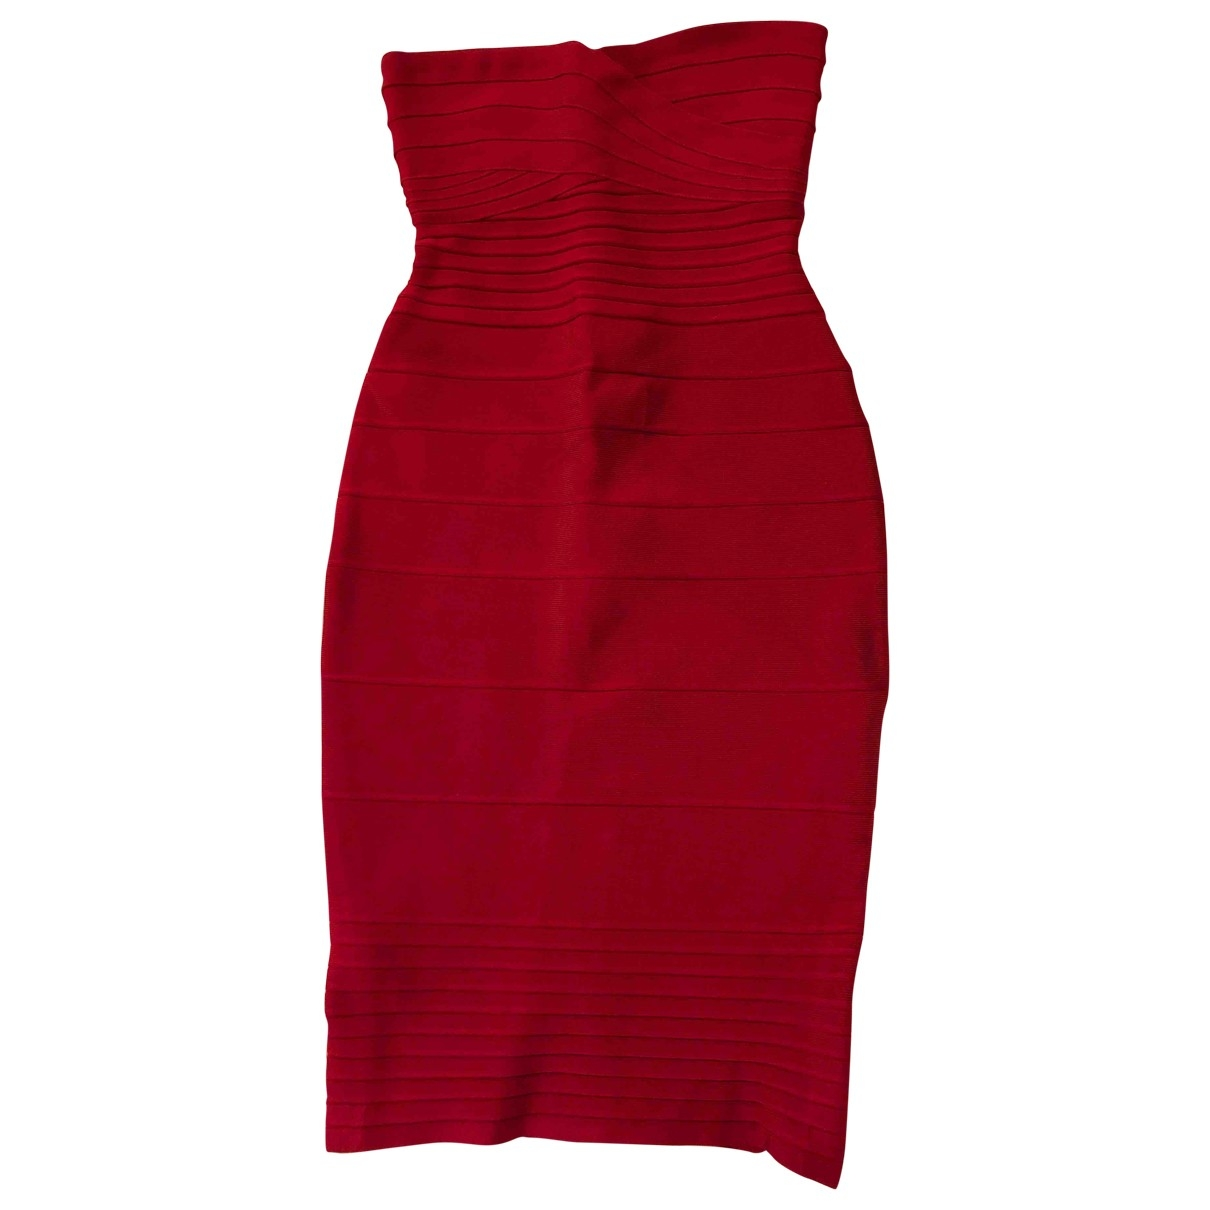 Herve Leger \N Red dress for Women XS International